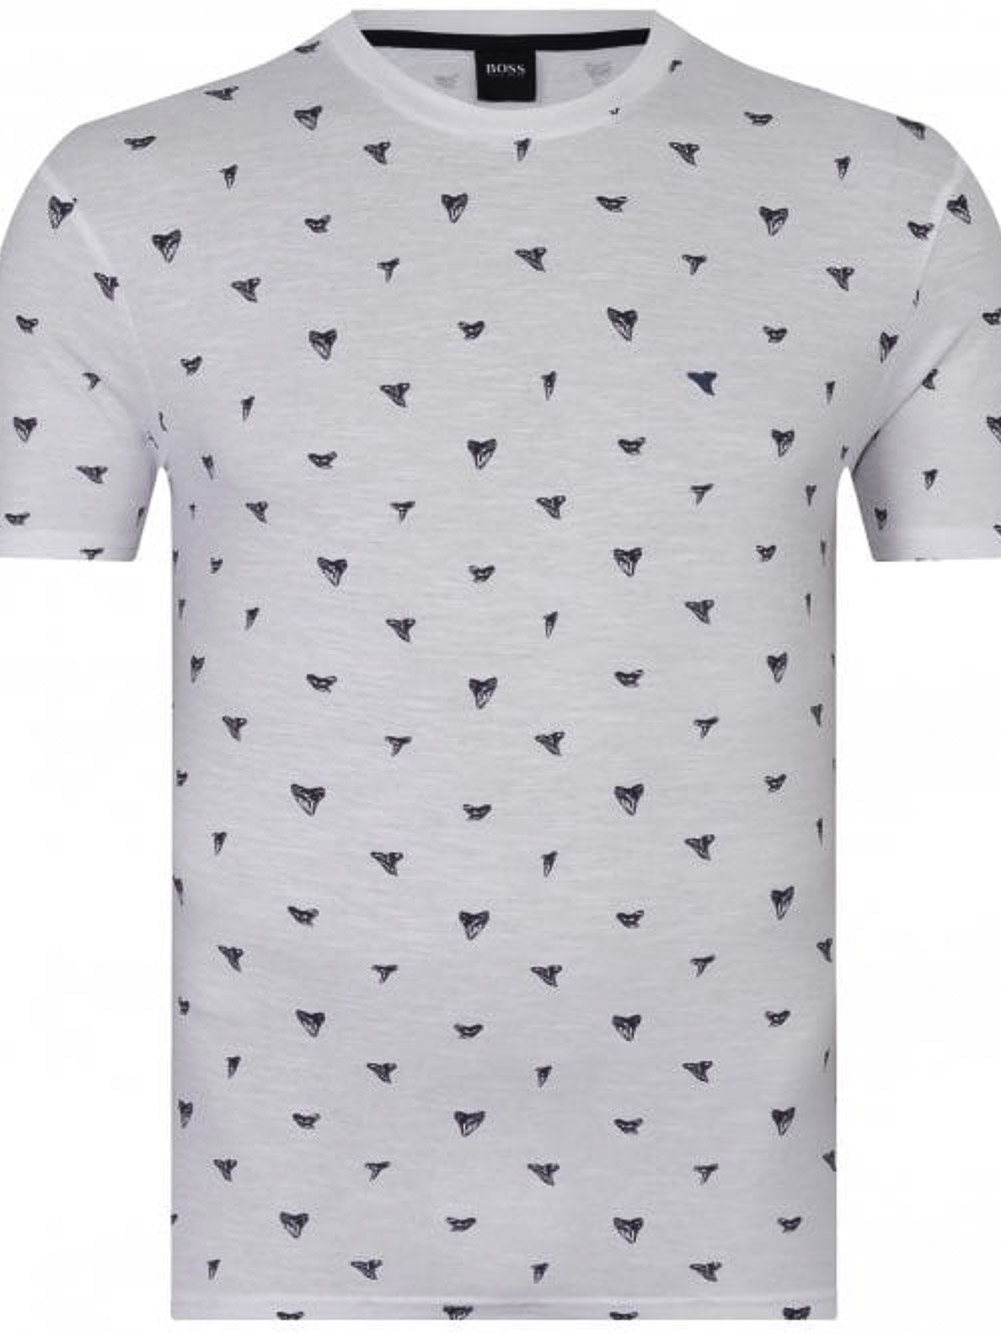 BOSS Μπλούζα t-shirt 50448161-100 ΛΕΥΚΟ